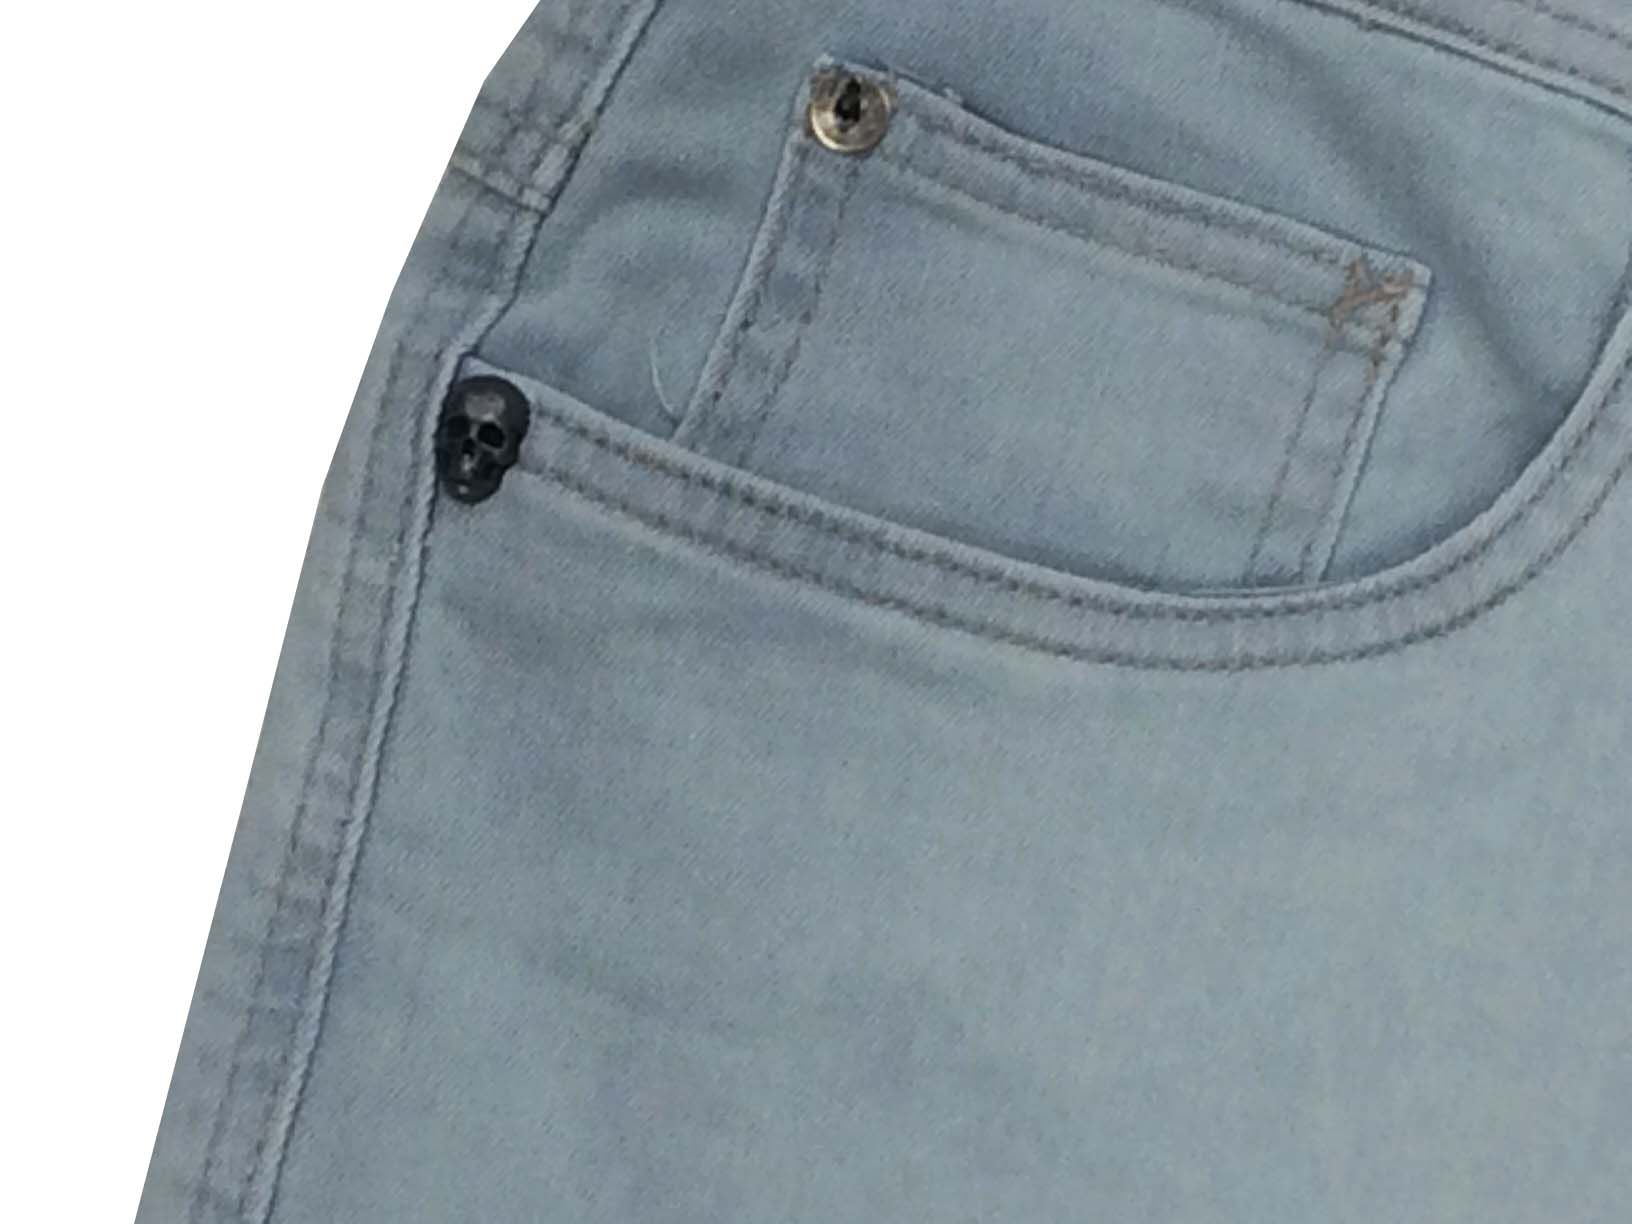 Calça Mcd Slim Sky Core 12023907 Jeans Claro Masculina